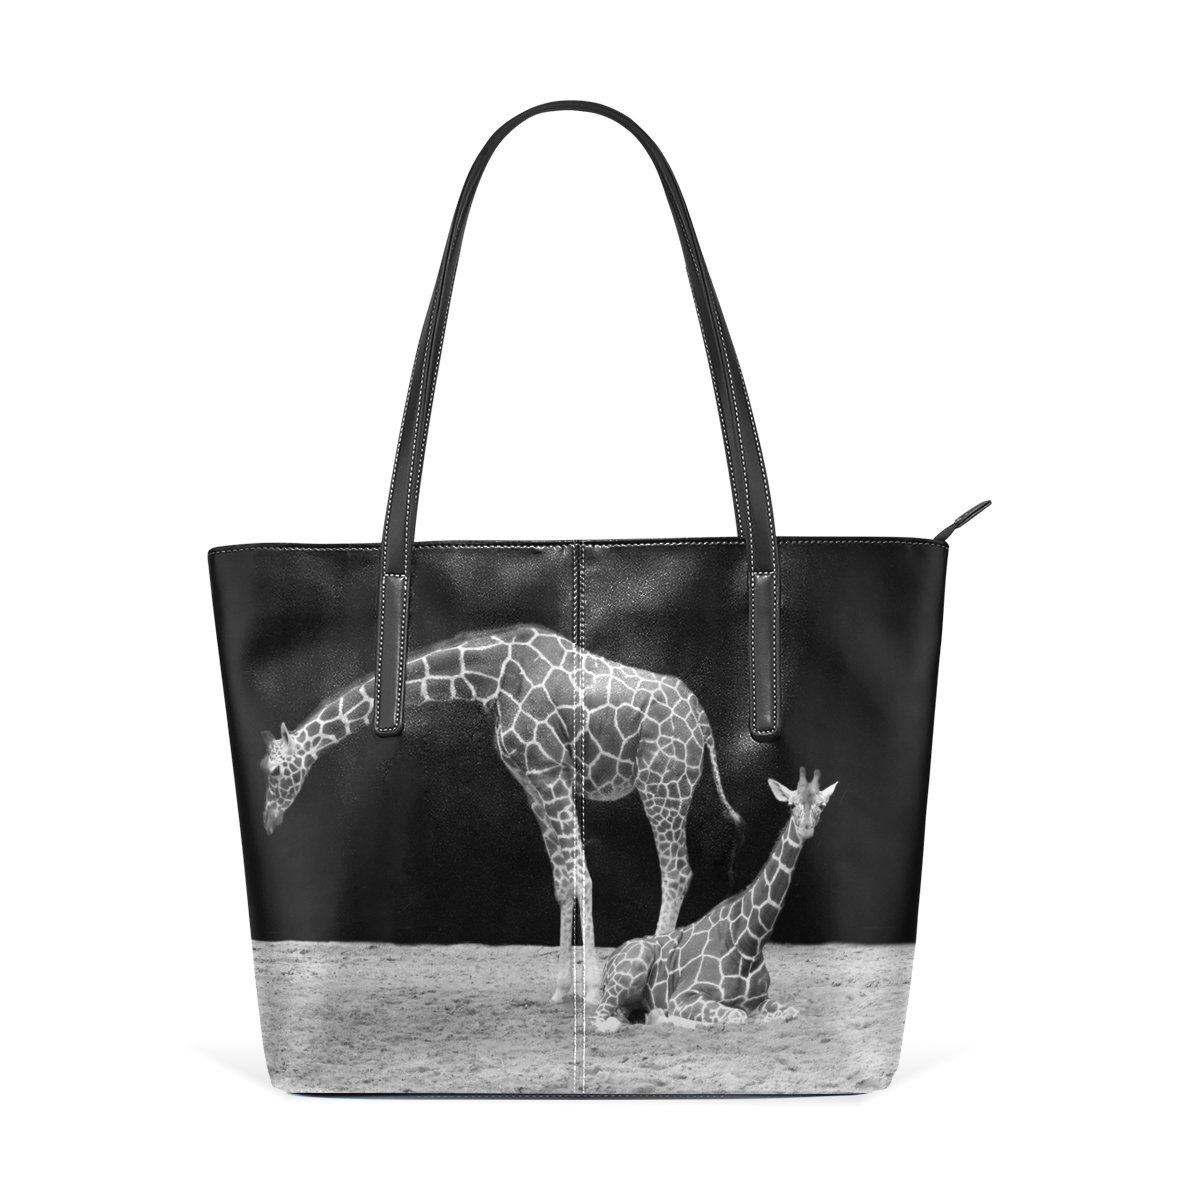 2c46ade7aab DEYYA Women s Vintage Giraffe Animal PU Leather Tote Shoulder Bag Handbag  g860492p103c117s150